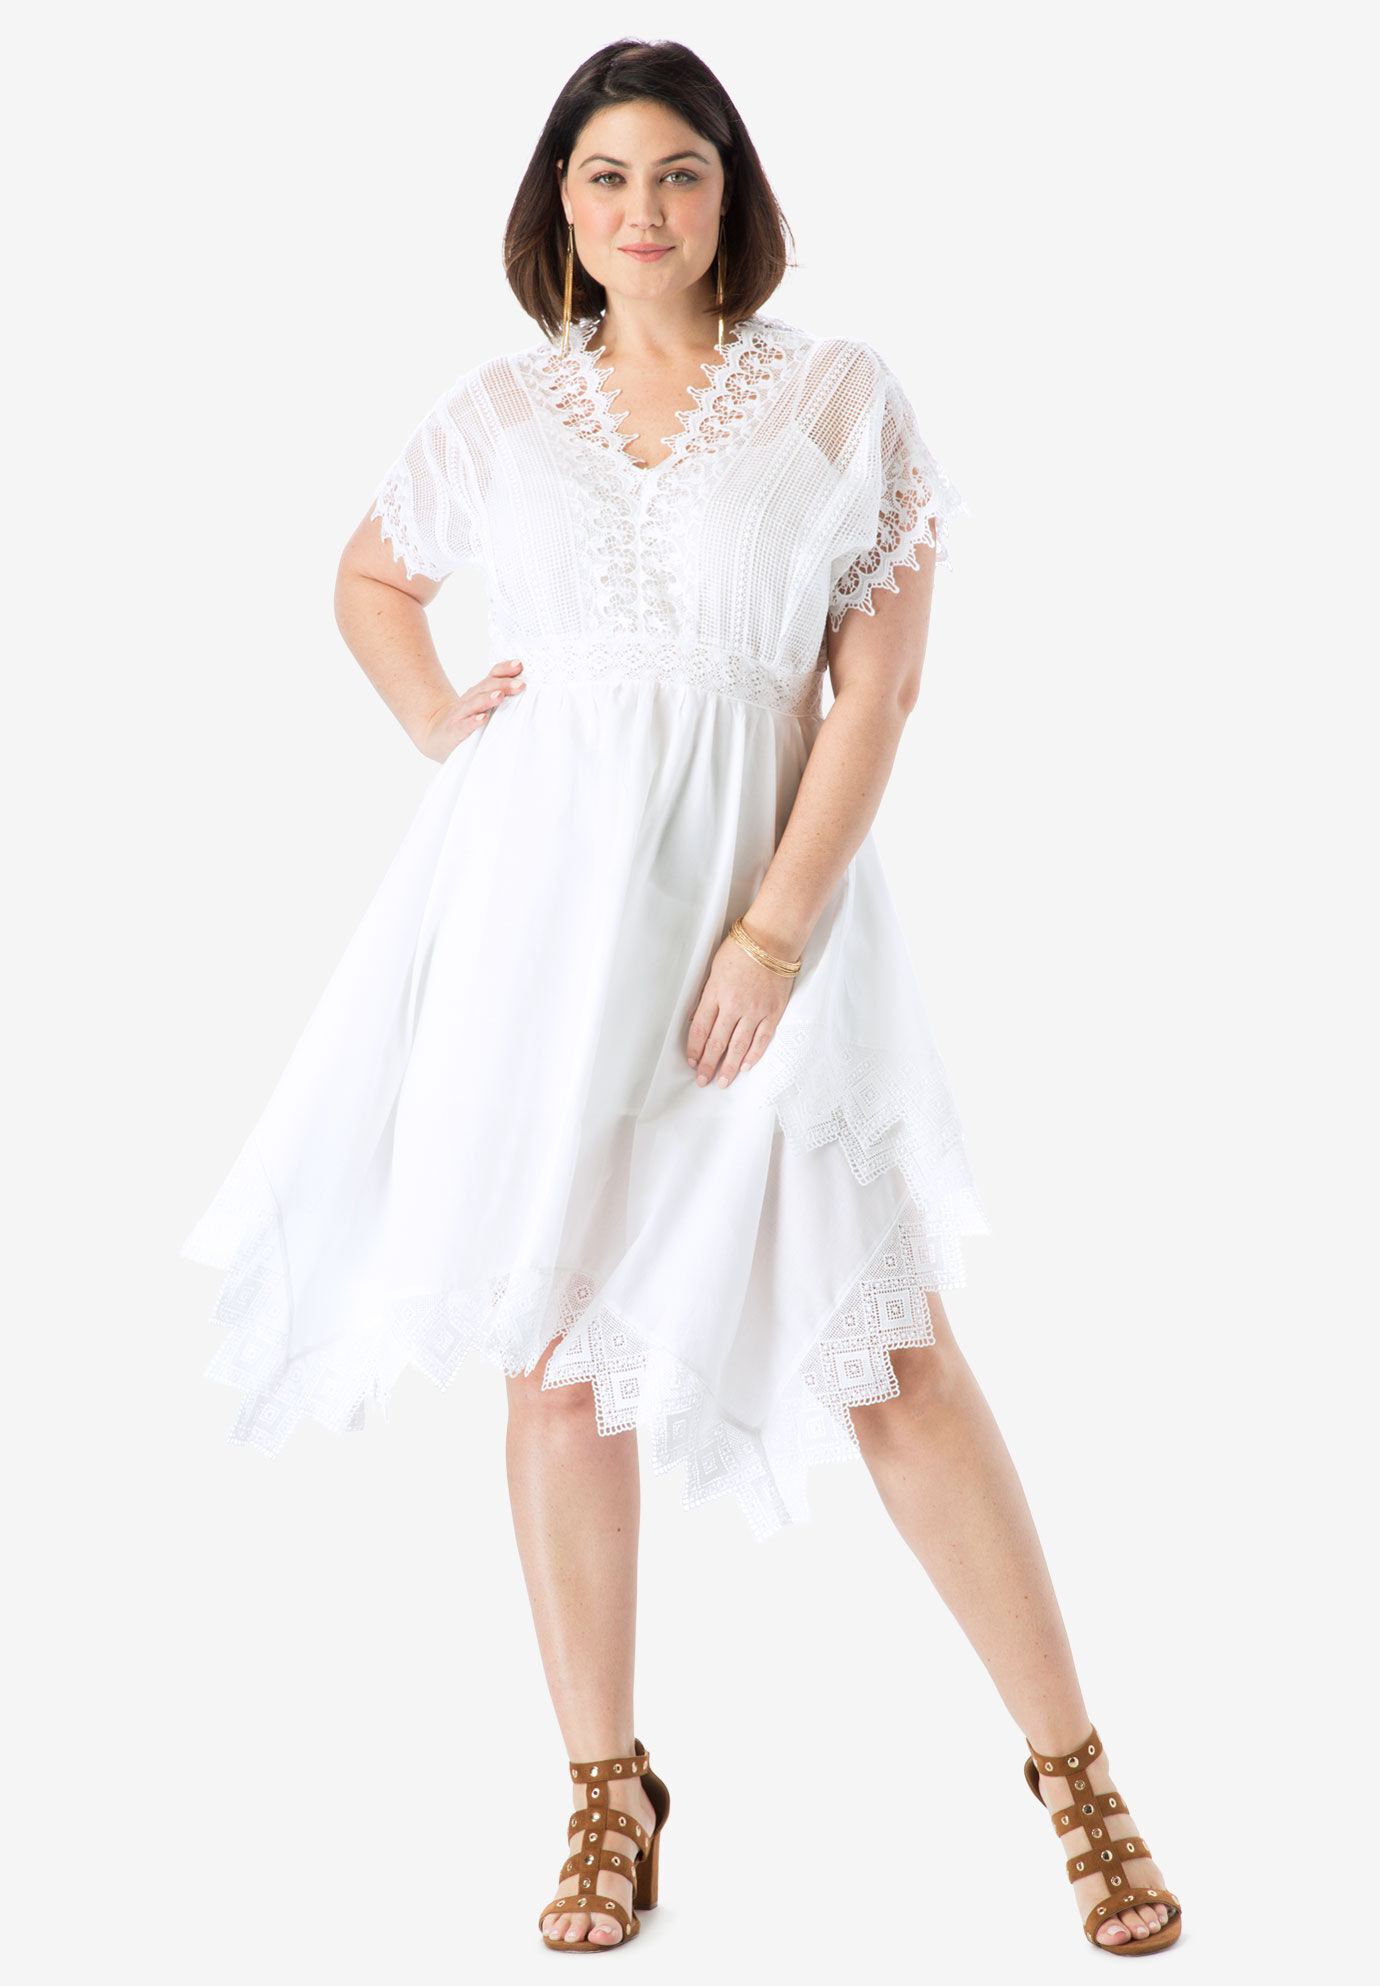 Roamans plus size clothing special occasion dresses